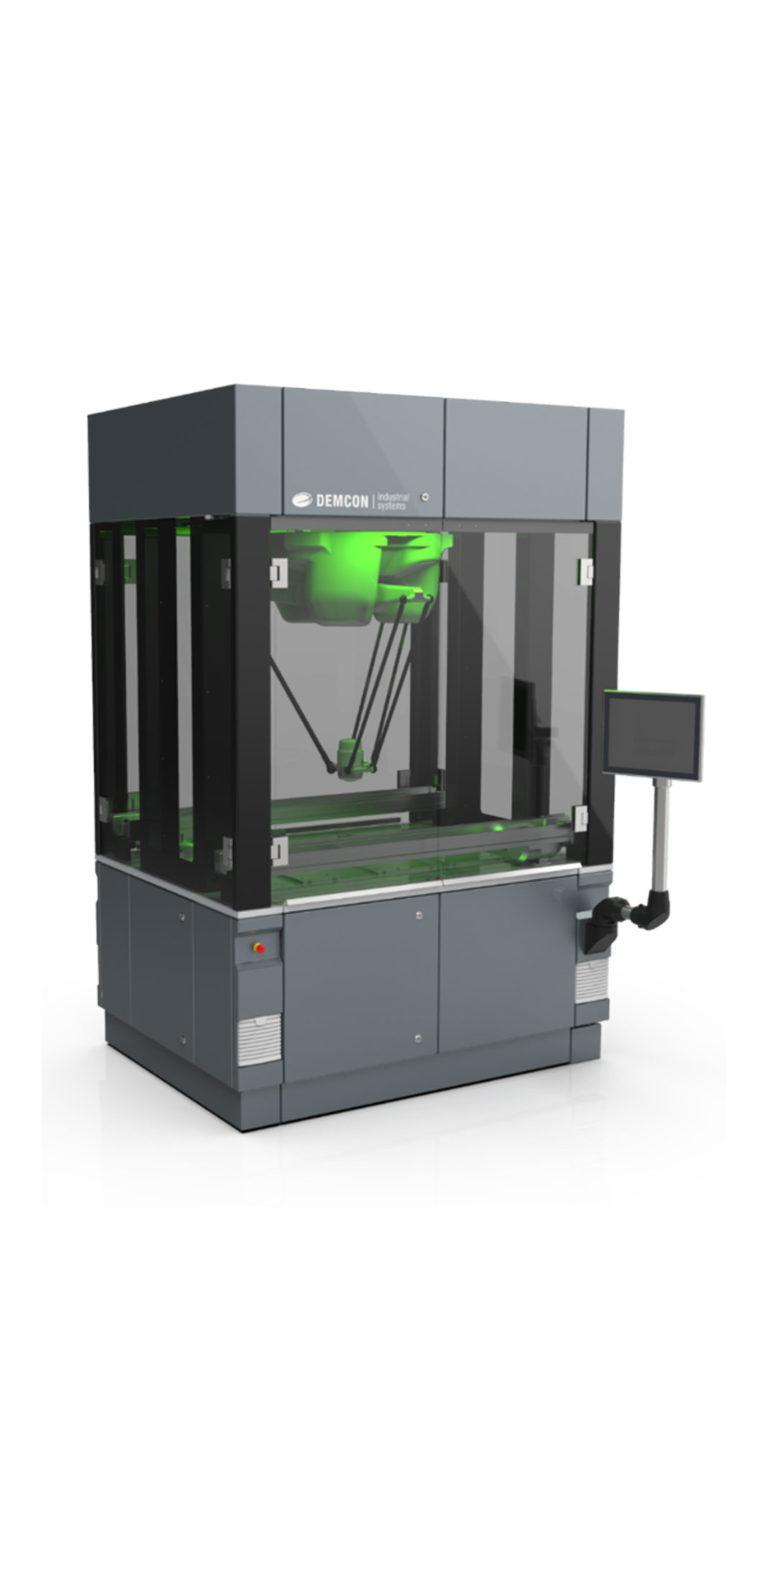 Slider-Case-Smart-Machine-Base-Demcon-3